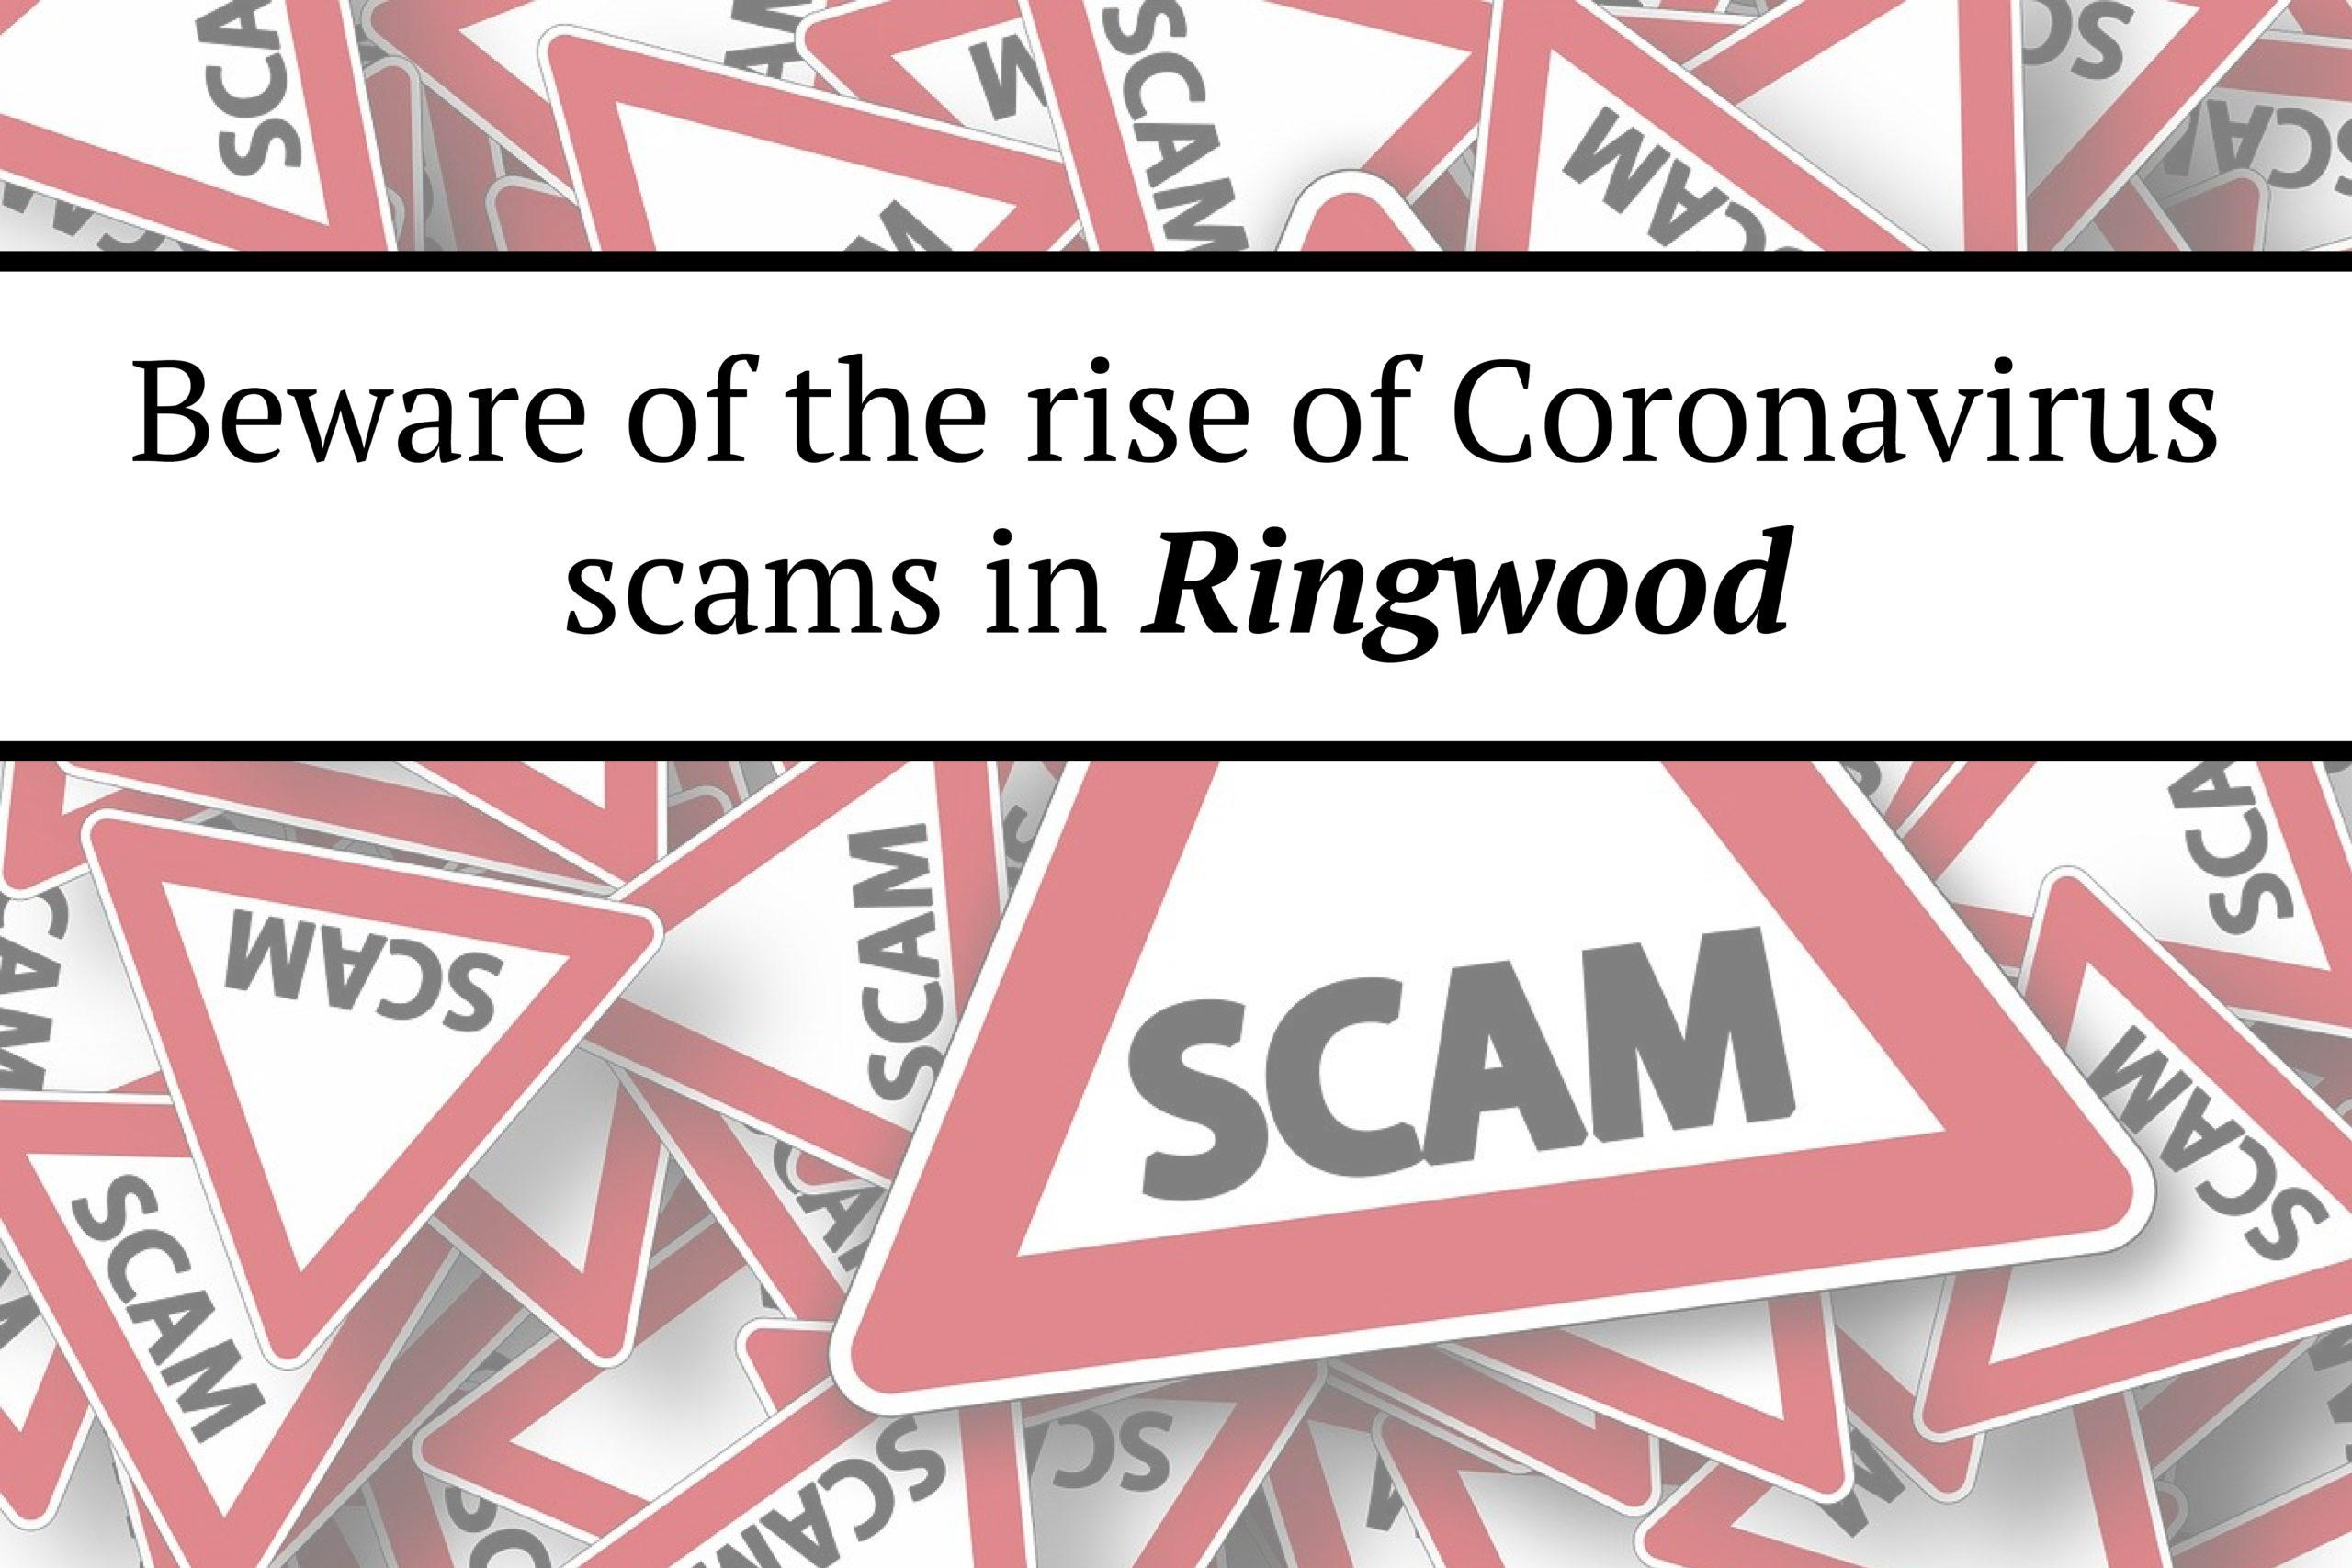 Beware of the rise of Coronavirus scams in Ringwood